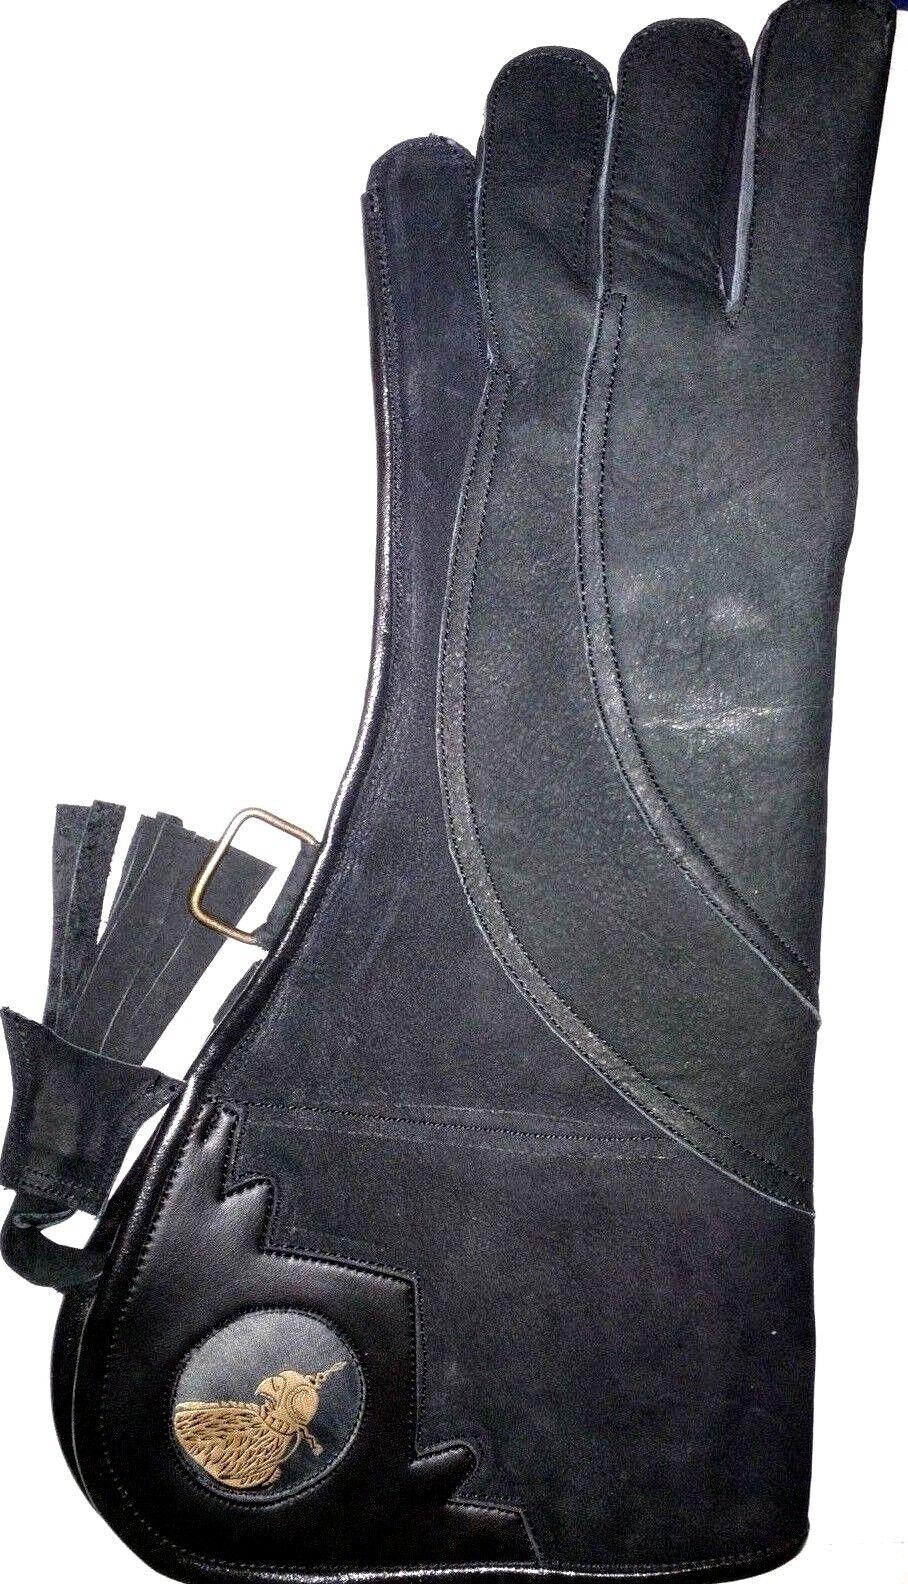 Heavy Duty Duty Duty Adler Falknerei Handschuh 43.2cmlong 4 Schicht Nubuk Leder ( Matt 463f39